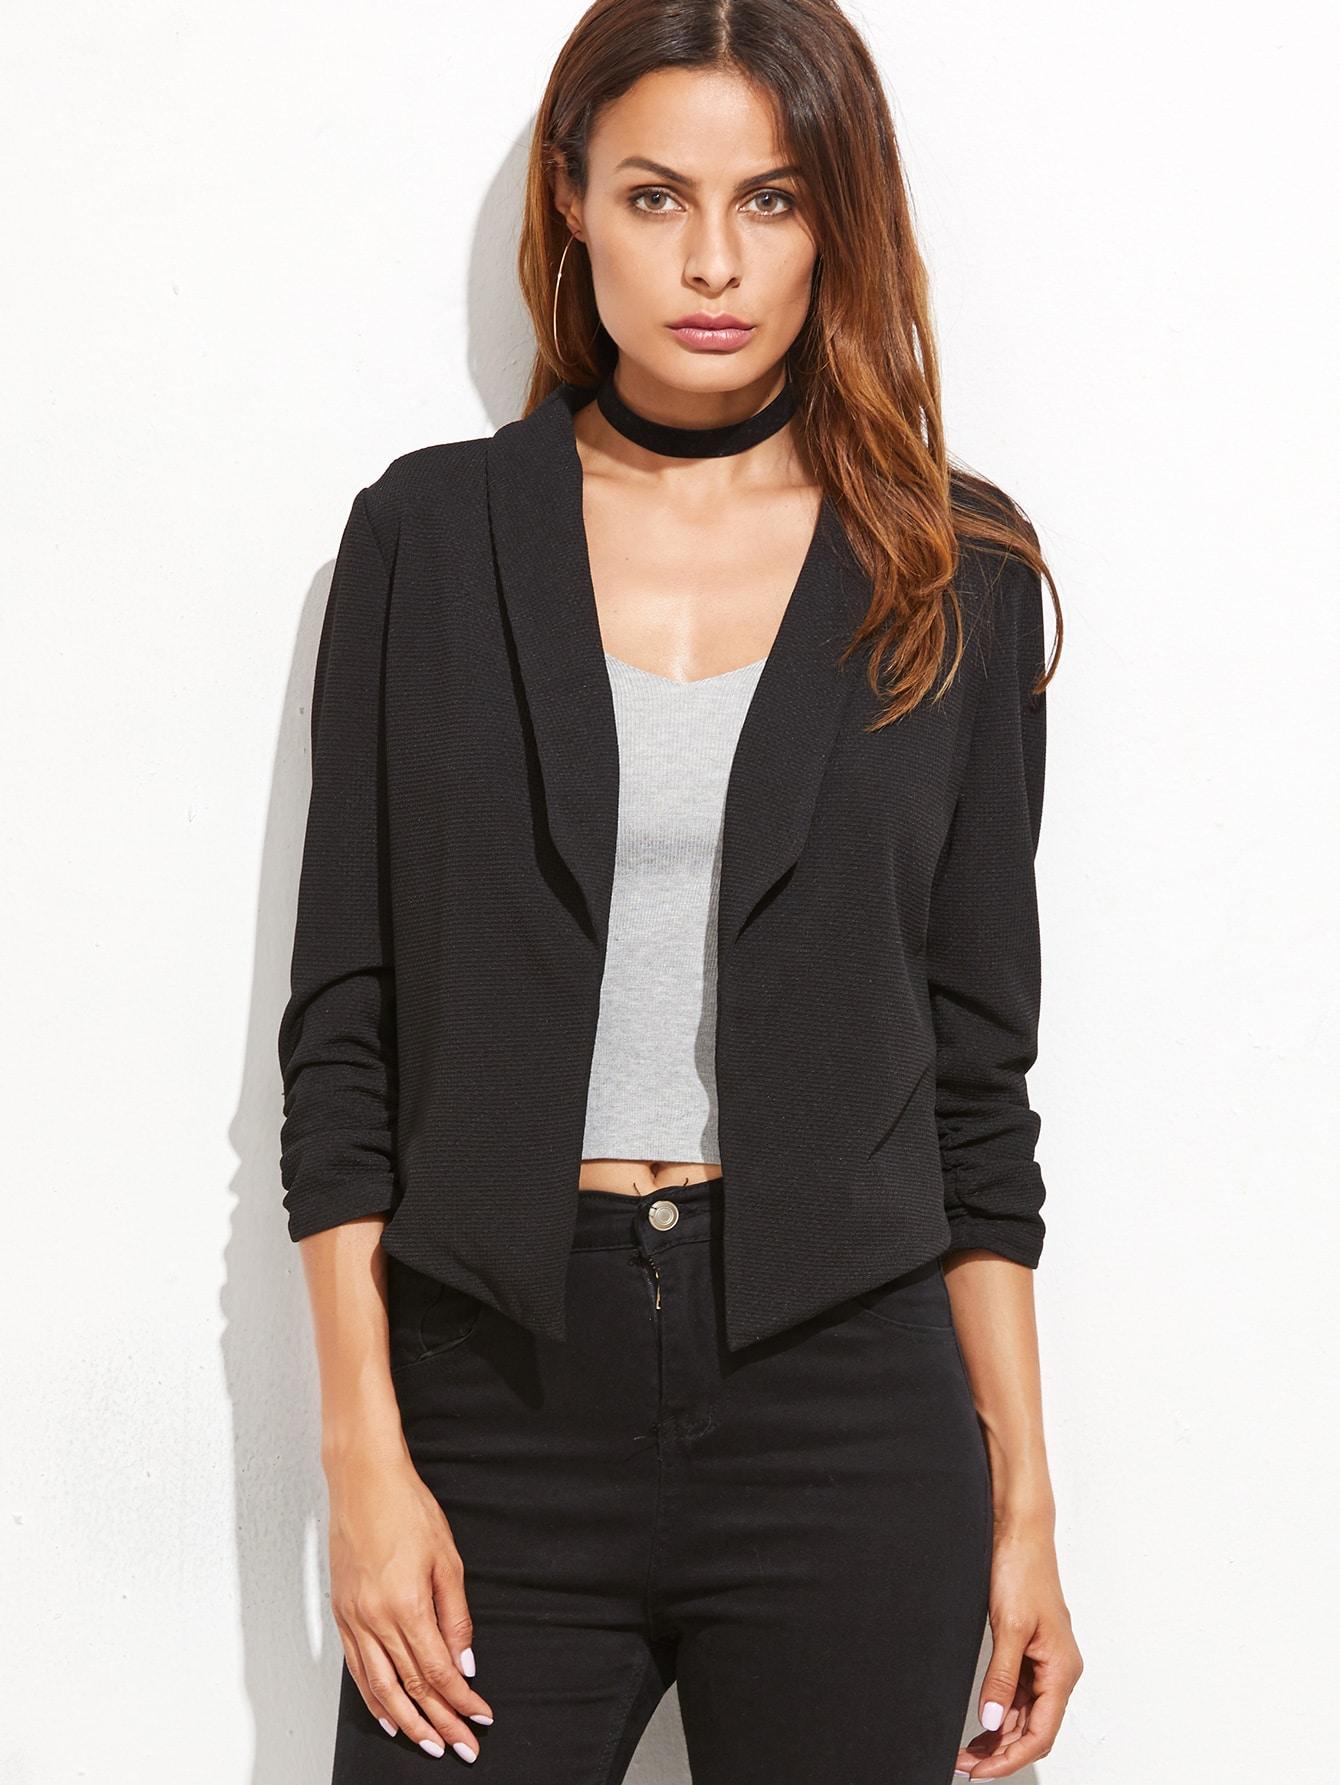 Black Shawl Collar Shirred Sleeve BlazerBlack Shawl Collar Shirred Sleeve Blazer<br><br>color: Black<br>size: L,M,S,XS